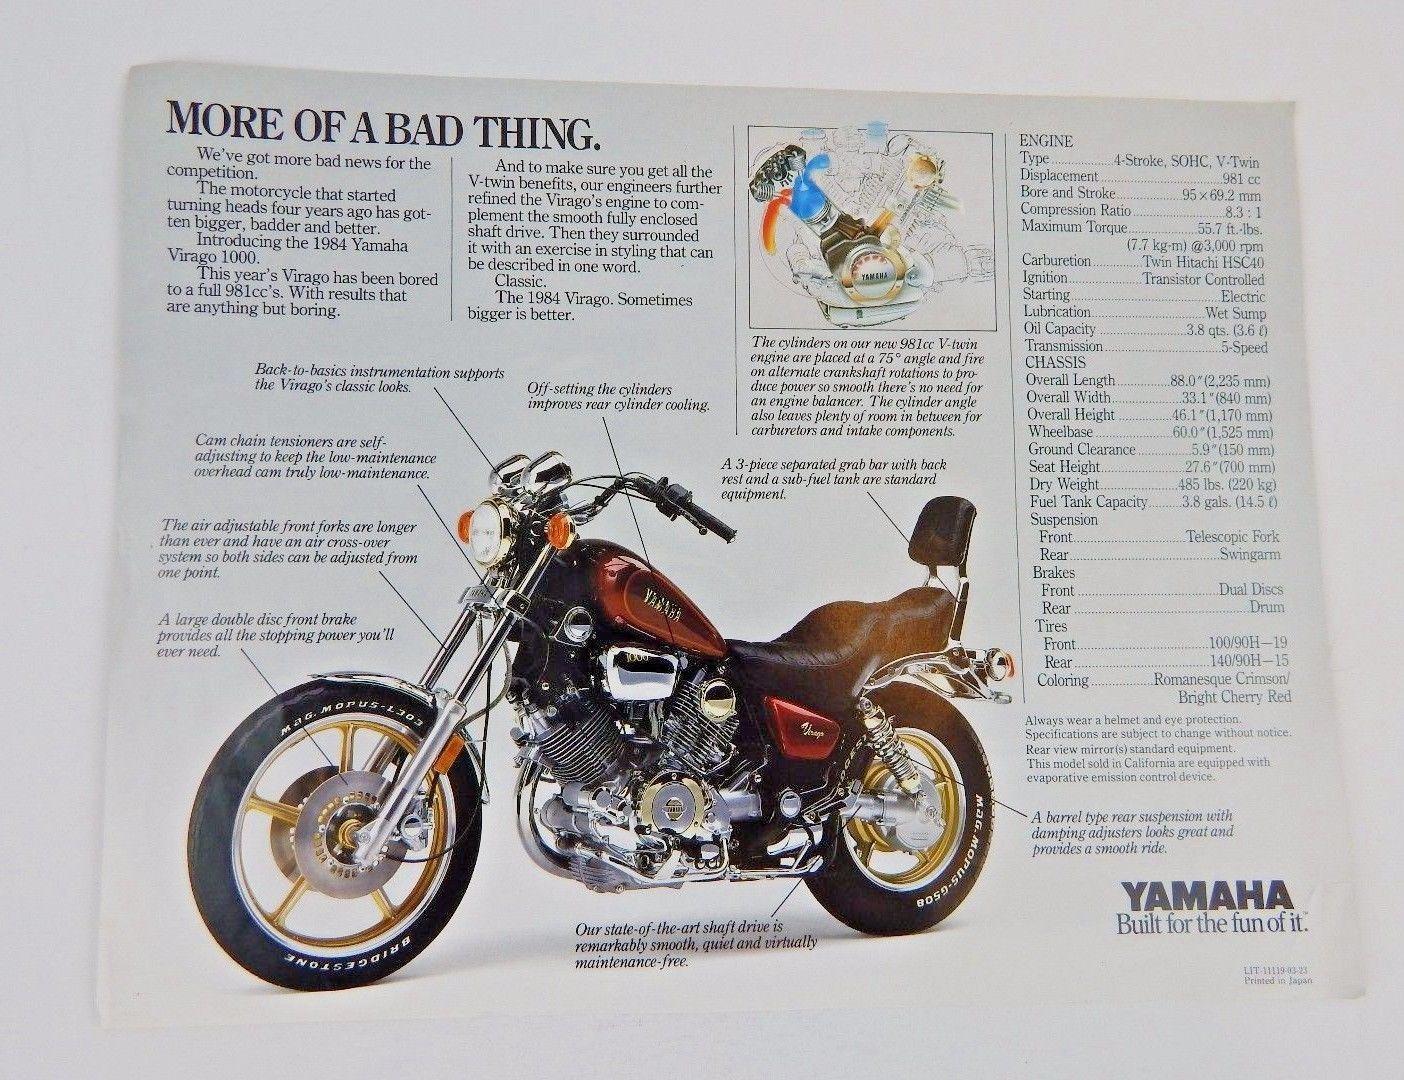 ... 1984 Yamaha Virago 700 & 1000 Single Sheet Sales Brochures ...